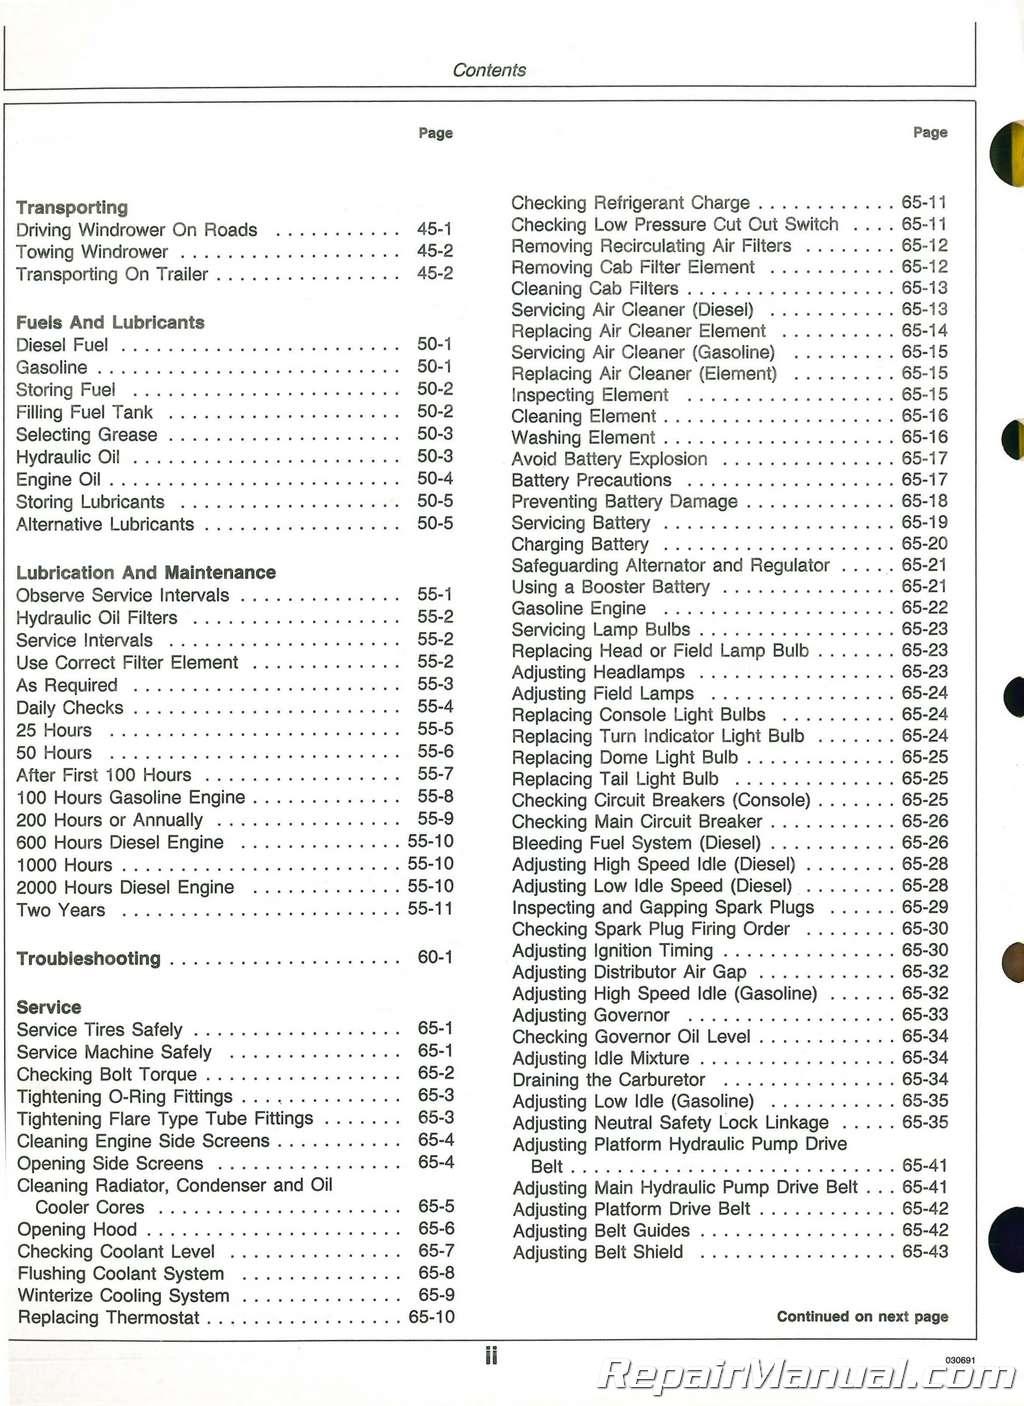 Used John Deere Self Propelled Windrower Operators Manual